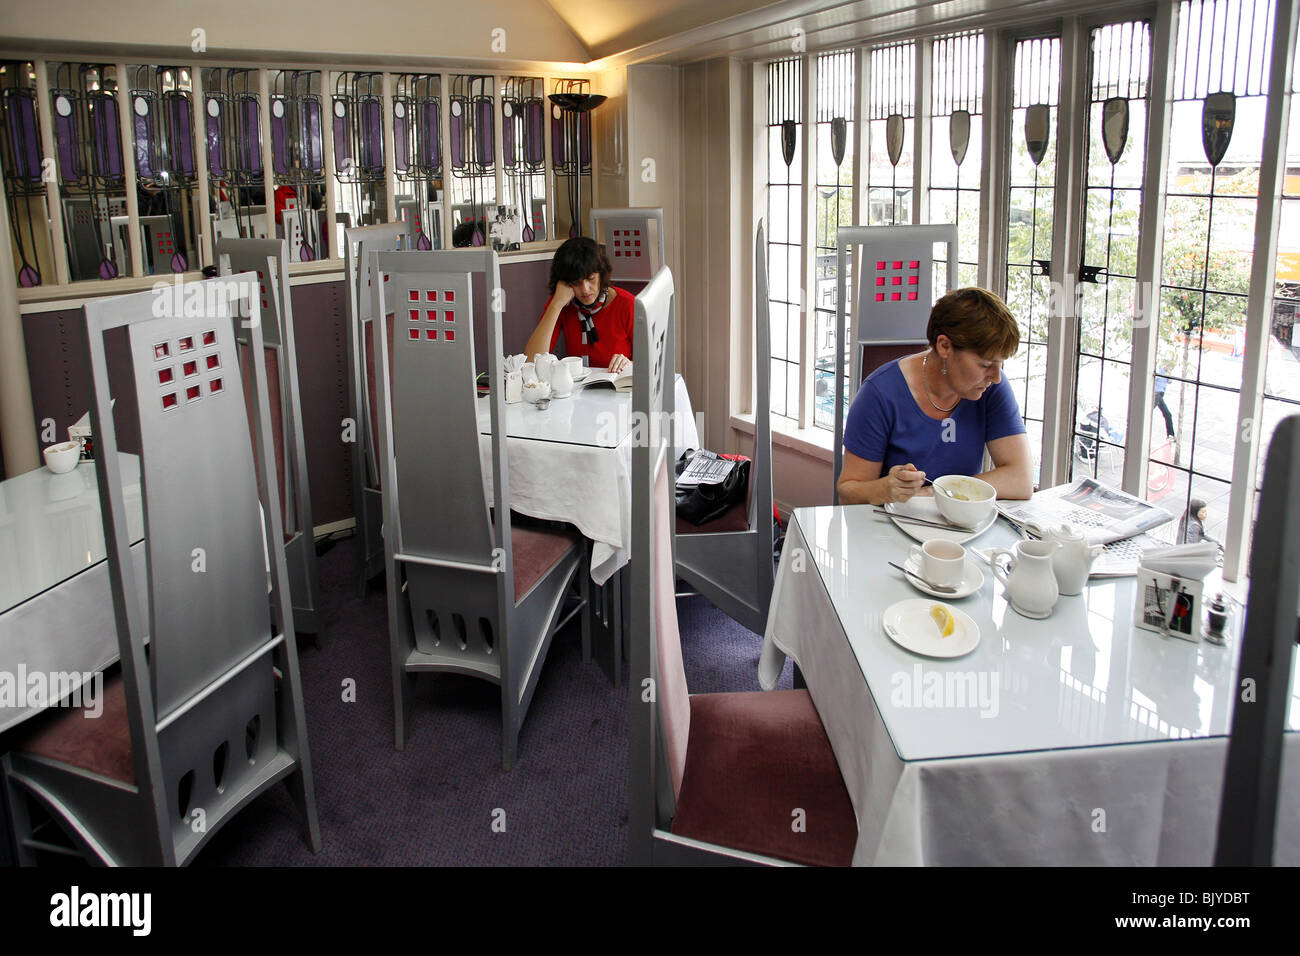 The Willow Tea Rooms, The Room Deluxe, Charles Rennie Mackintosh, Sauchiehall Street, Glasgow, Scotland - Stock Image